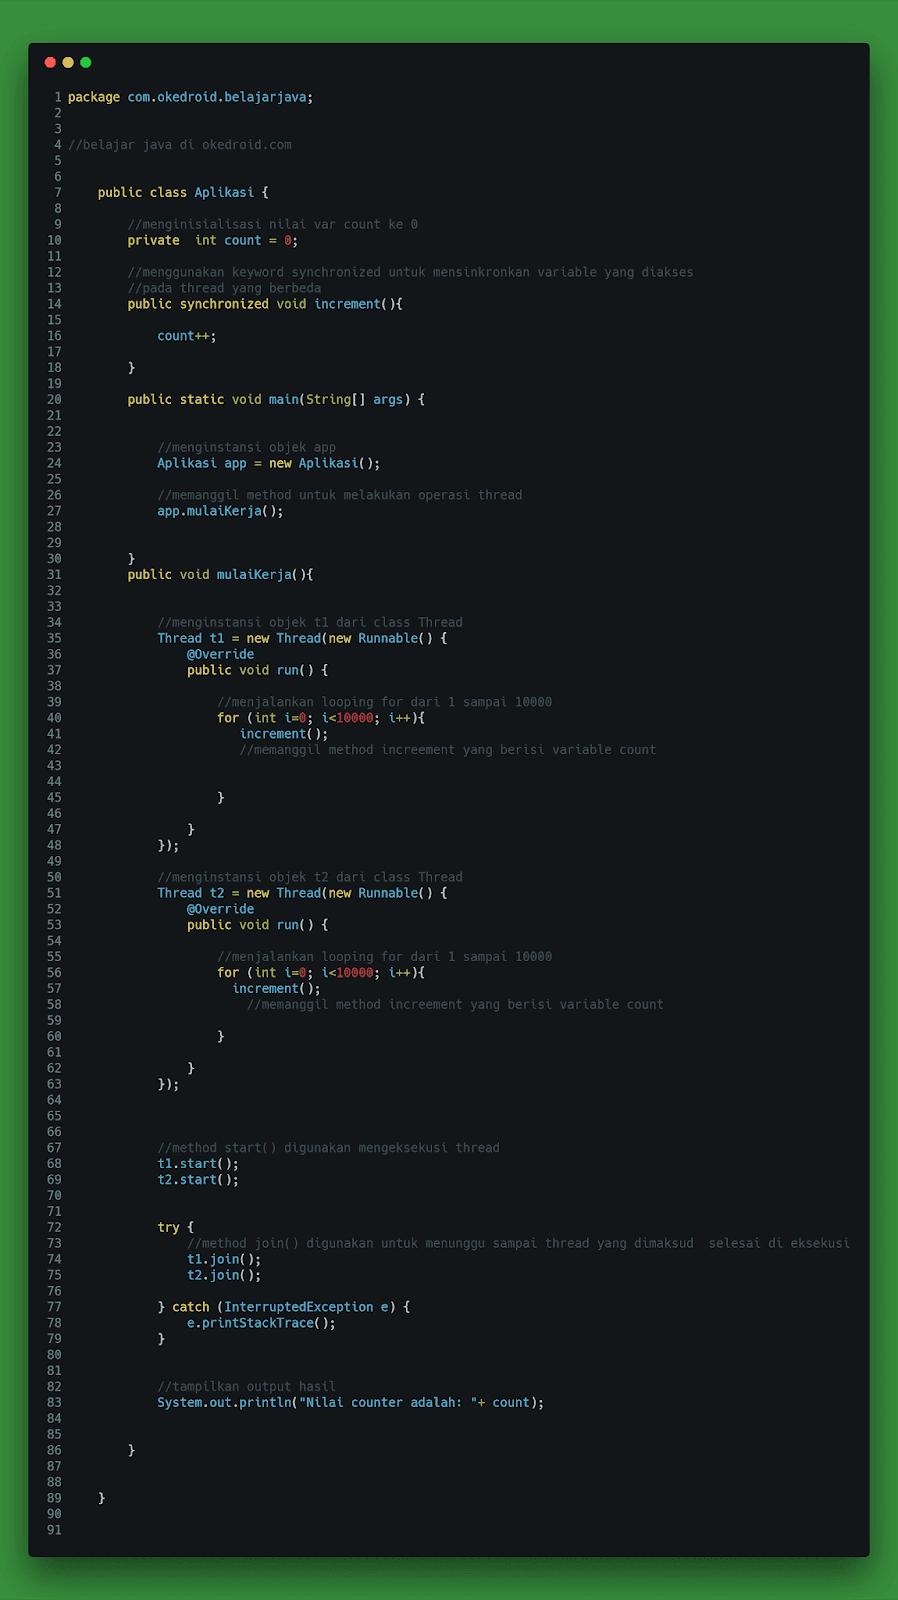 contoh code kode program yang menggunakan fungsi keyword synchronized di java